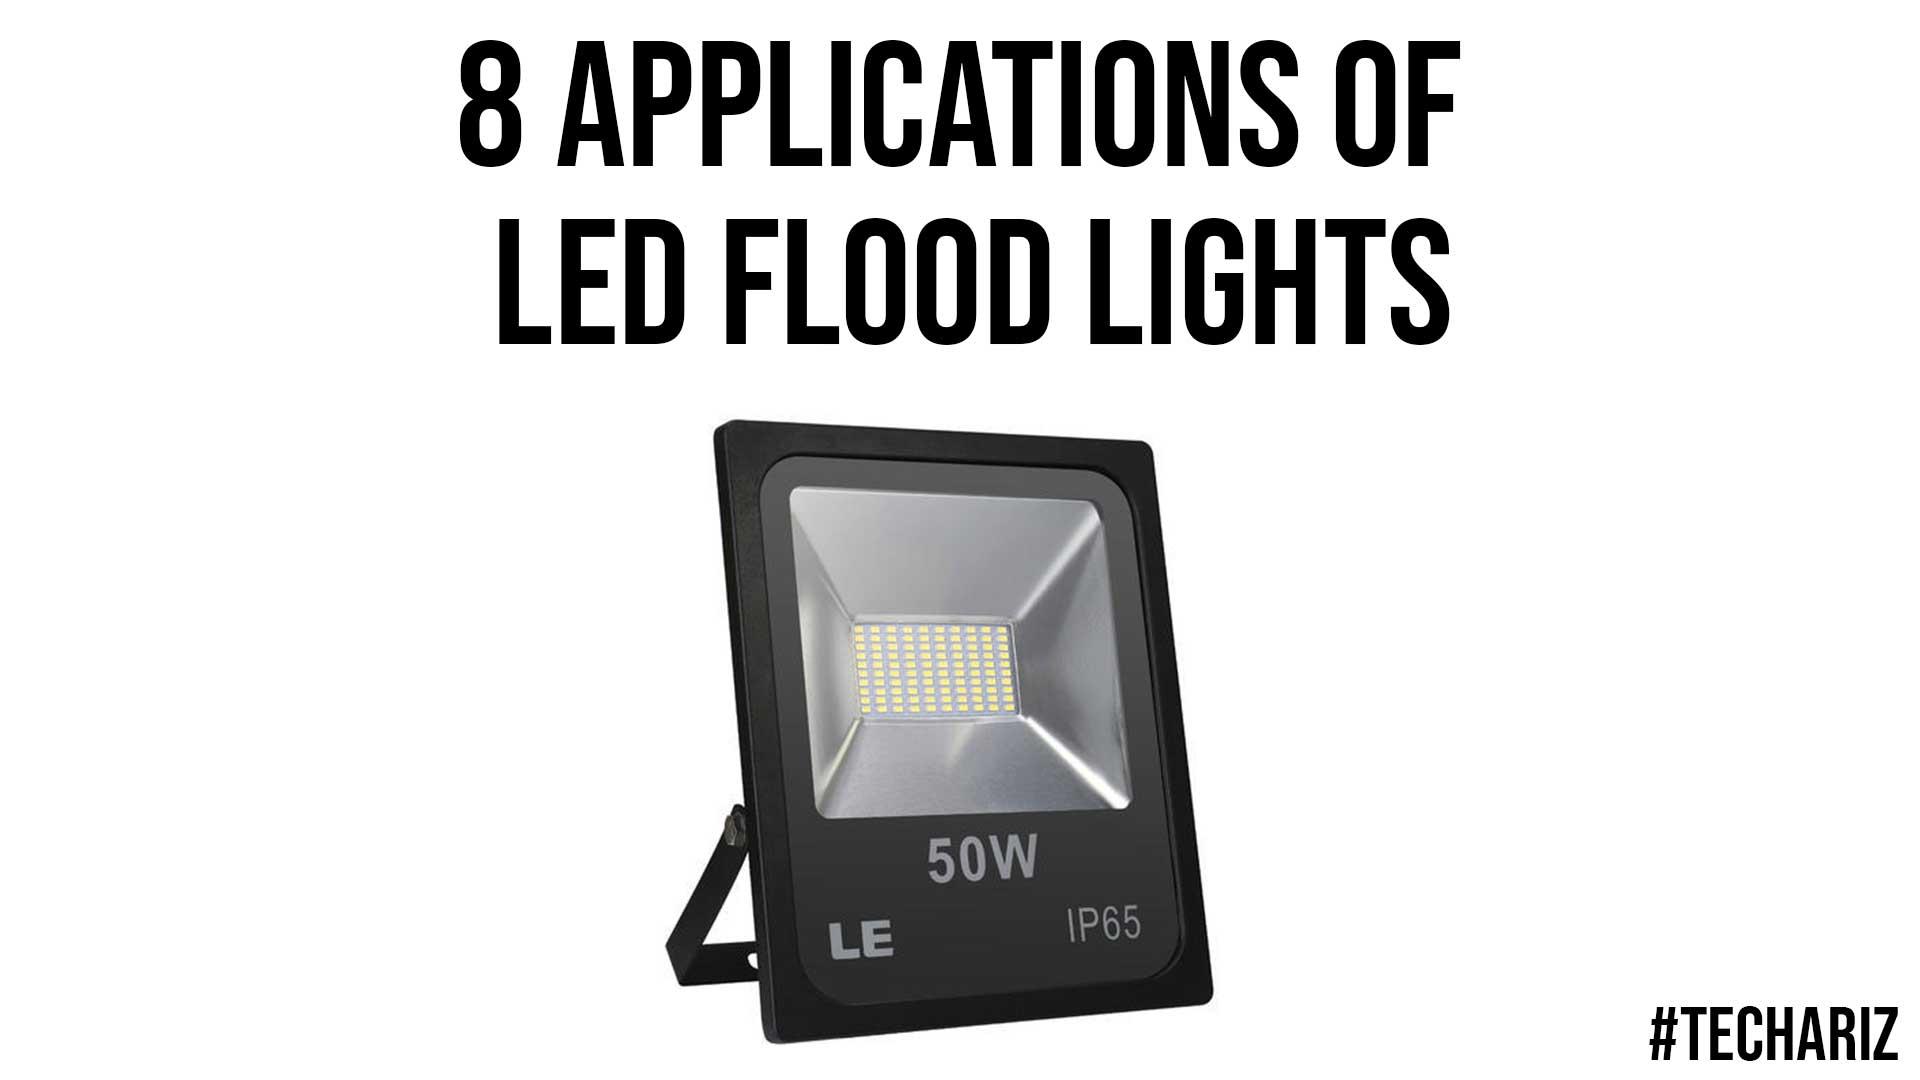 8 Applications of LED Flood Lights